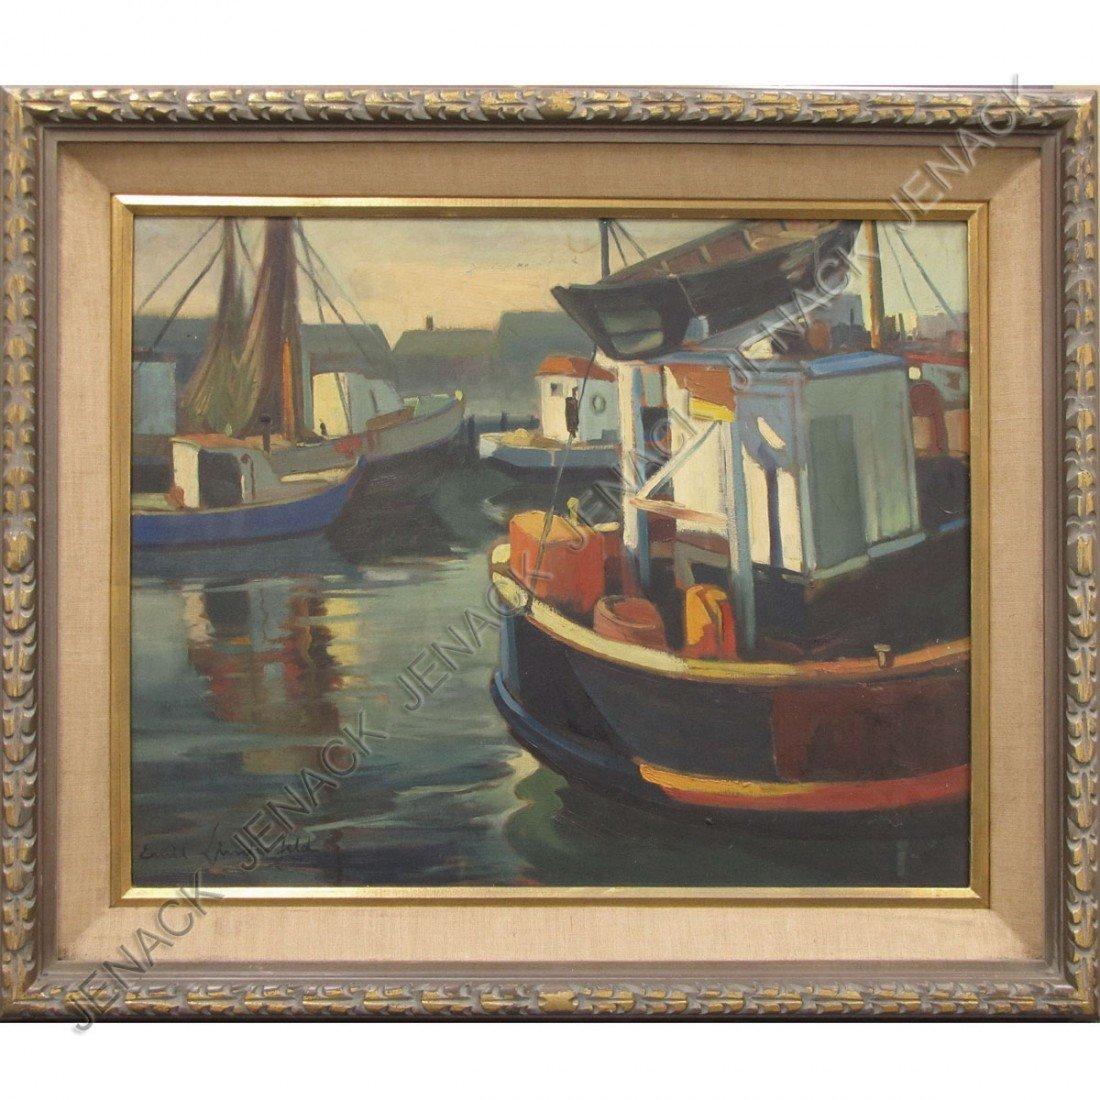 107: EMIL LINDENFELD (ITALIAN/AMERICAN 1905-1986), OIL